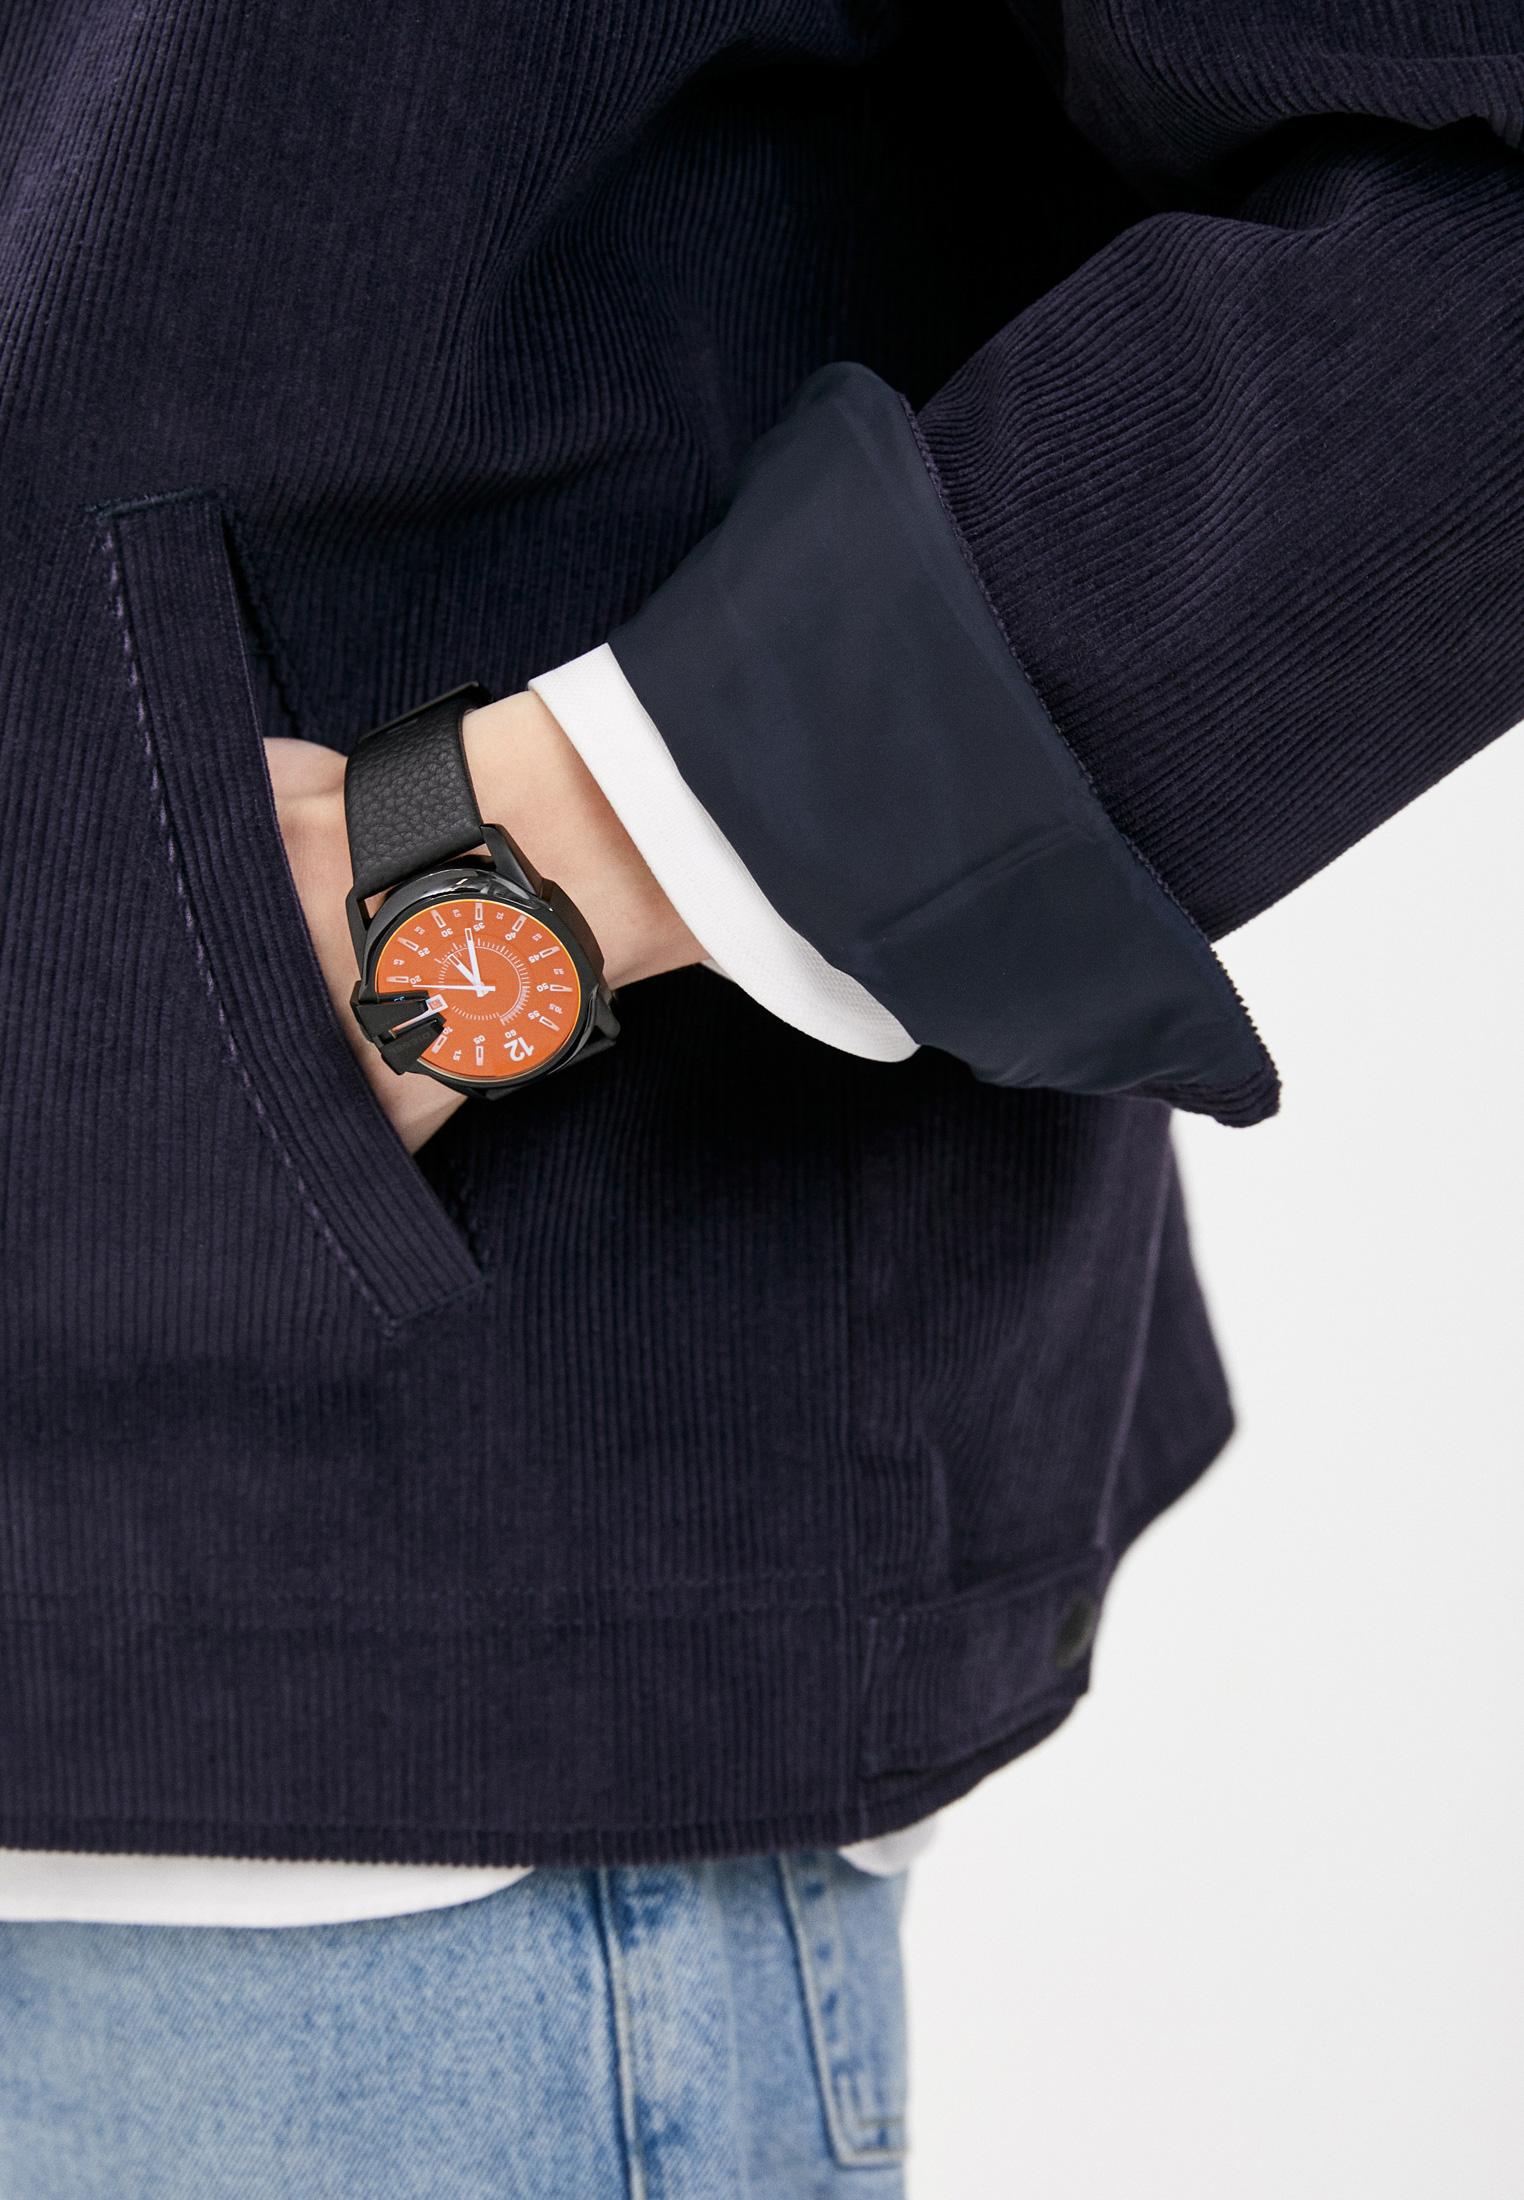 Мужские часы Diesel (Дизель) DZ1657